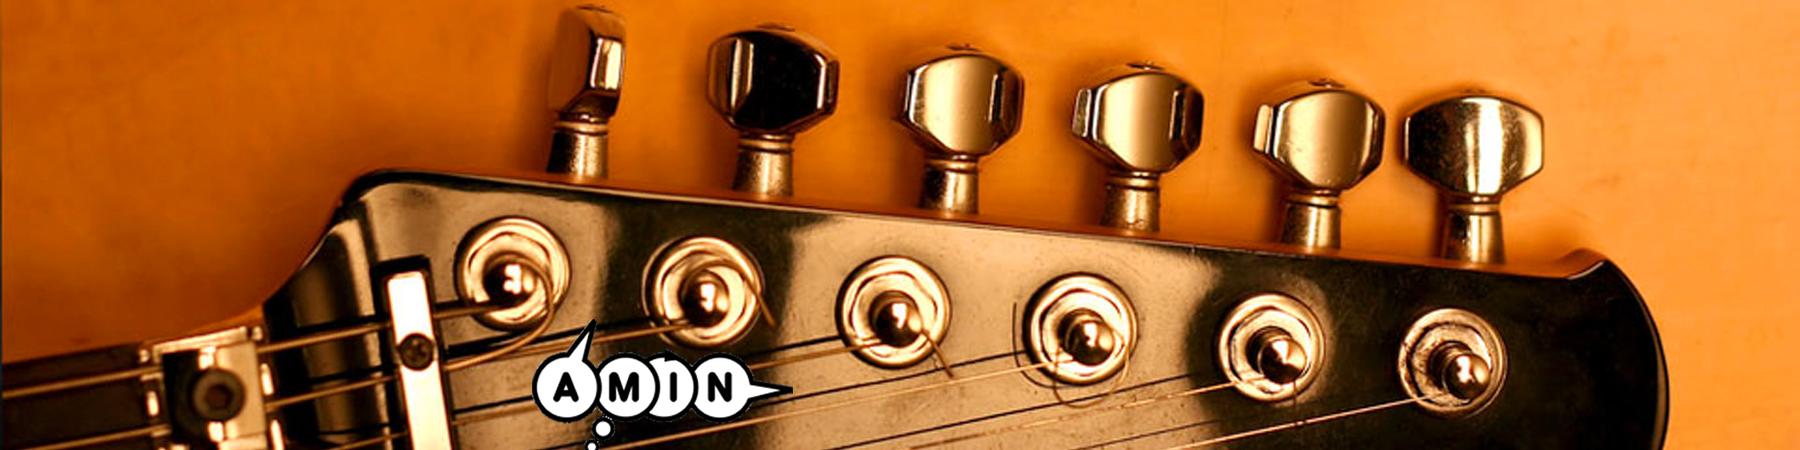 Amin-guitar-RELEASE-slider